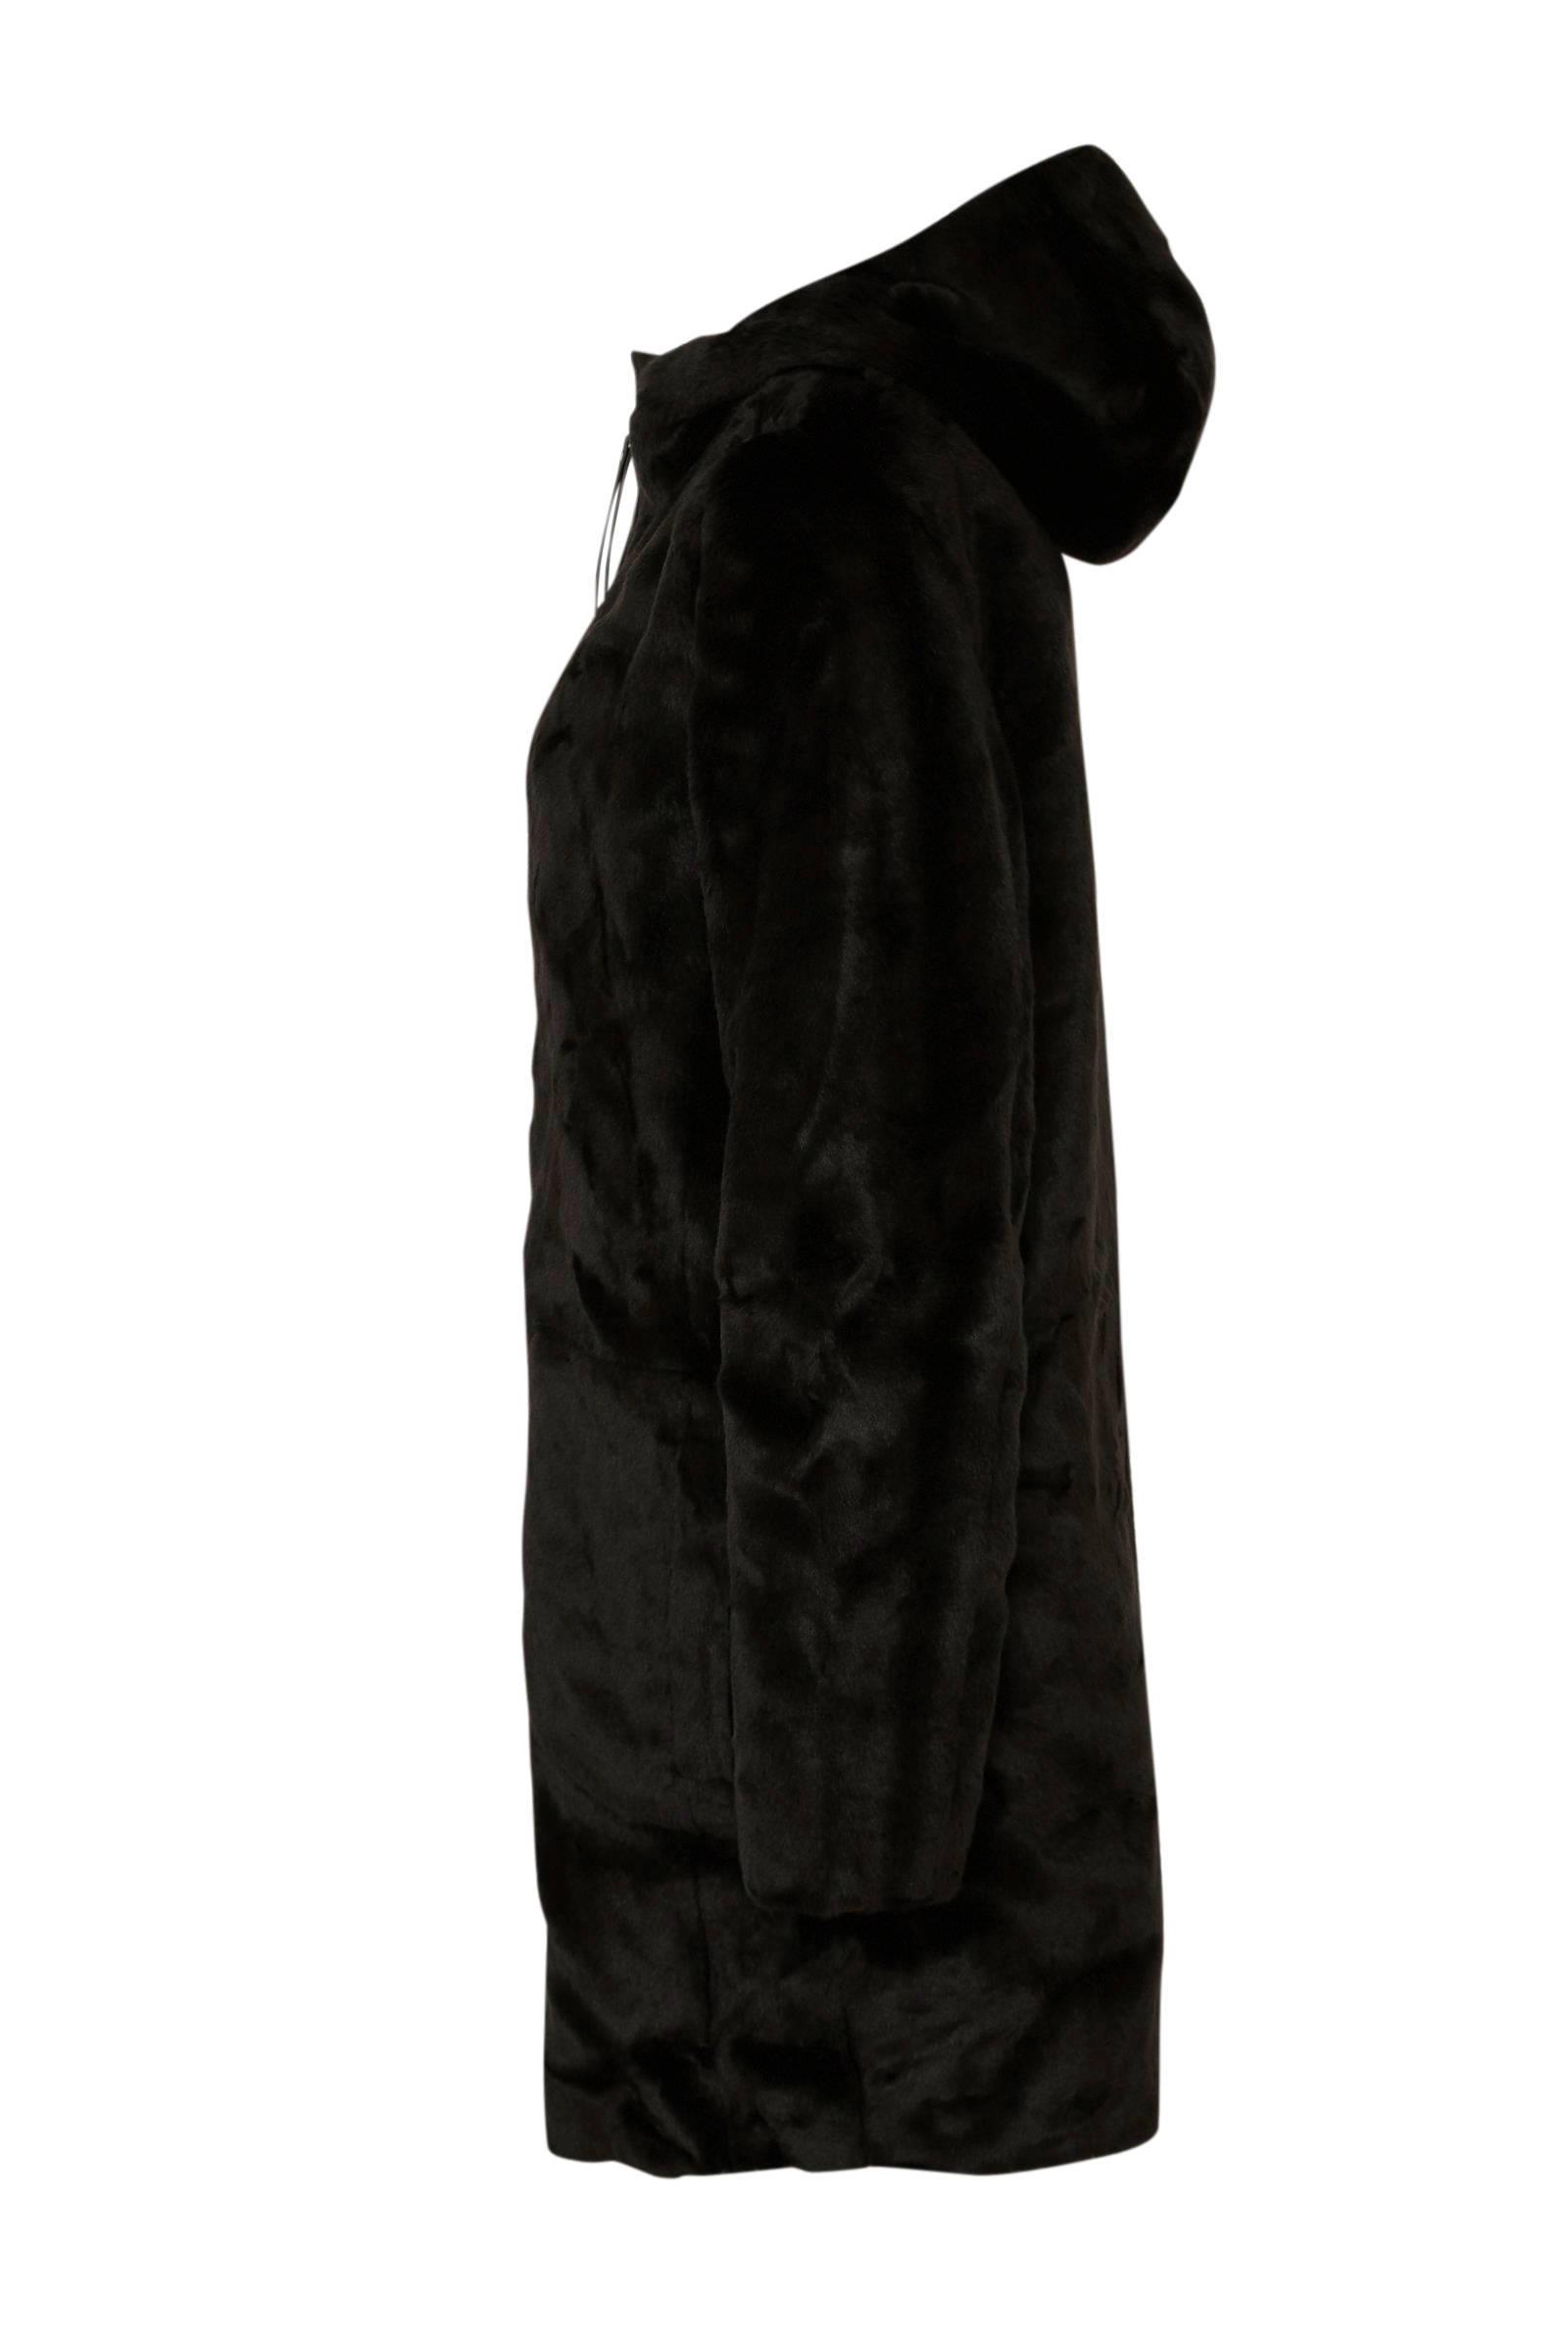 Giacomo winterjas zwart | wehkamp